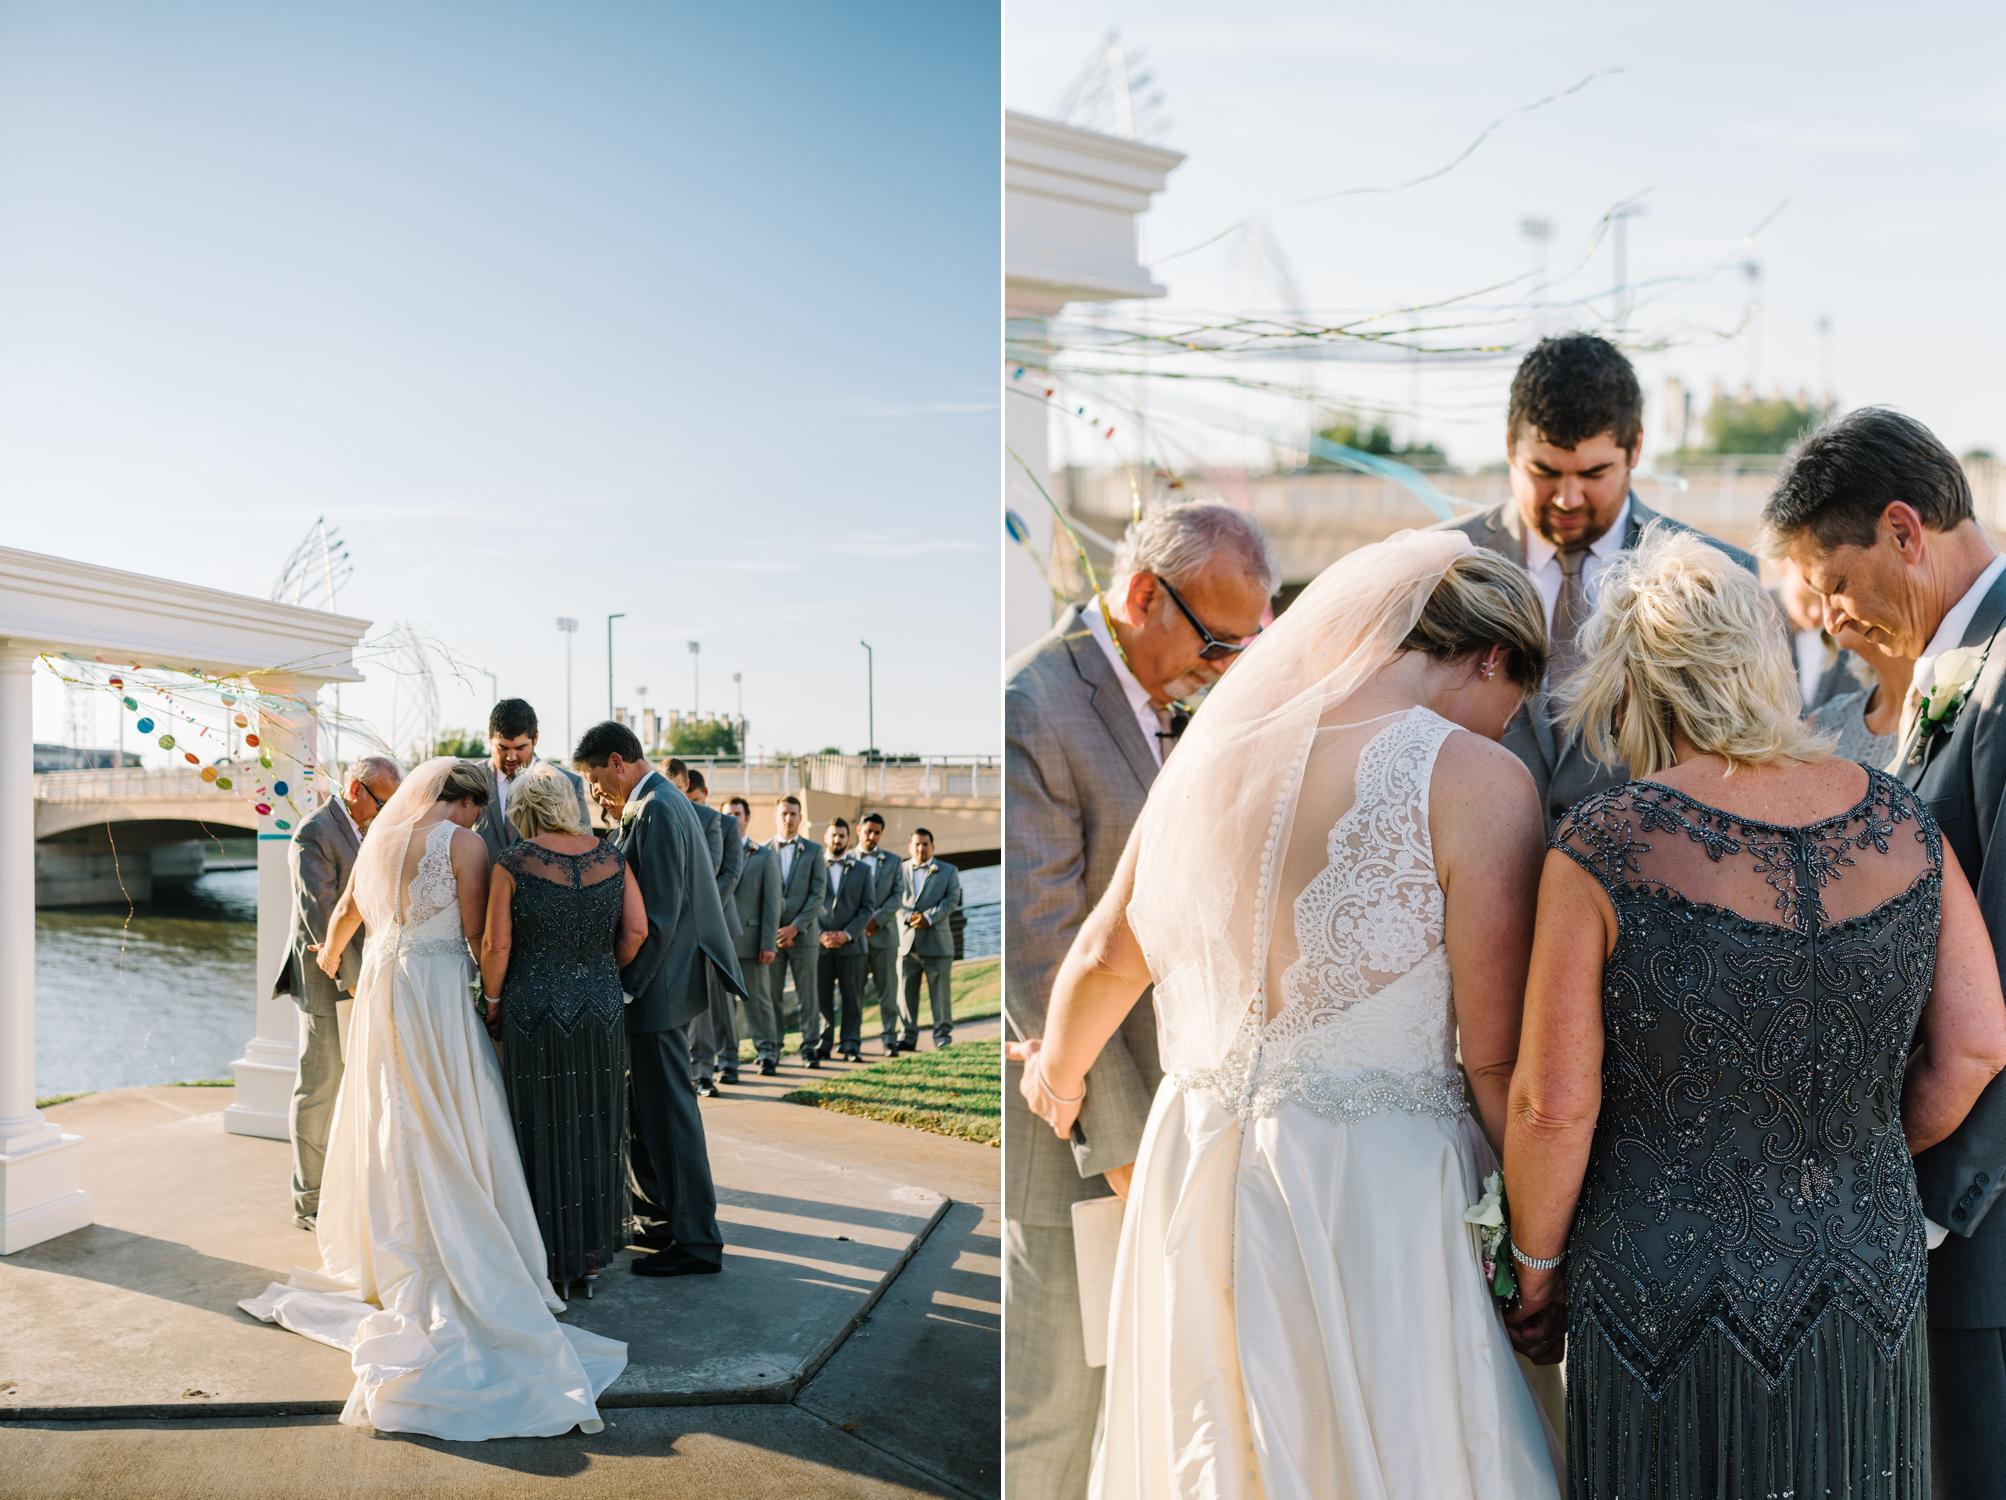 Wichita, Kansas Wedding Photographer-Neal Dieker-Wichita Boathouse Wedding-Wichita, Kansas Outdoor Wedding-193.jpg